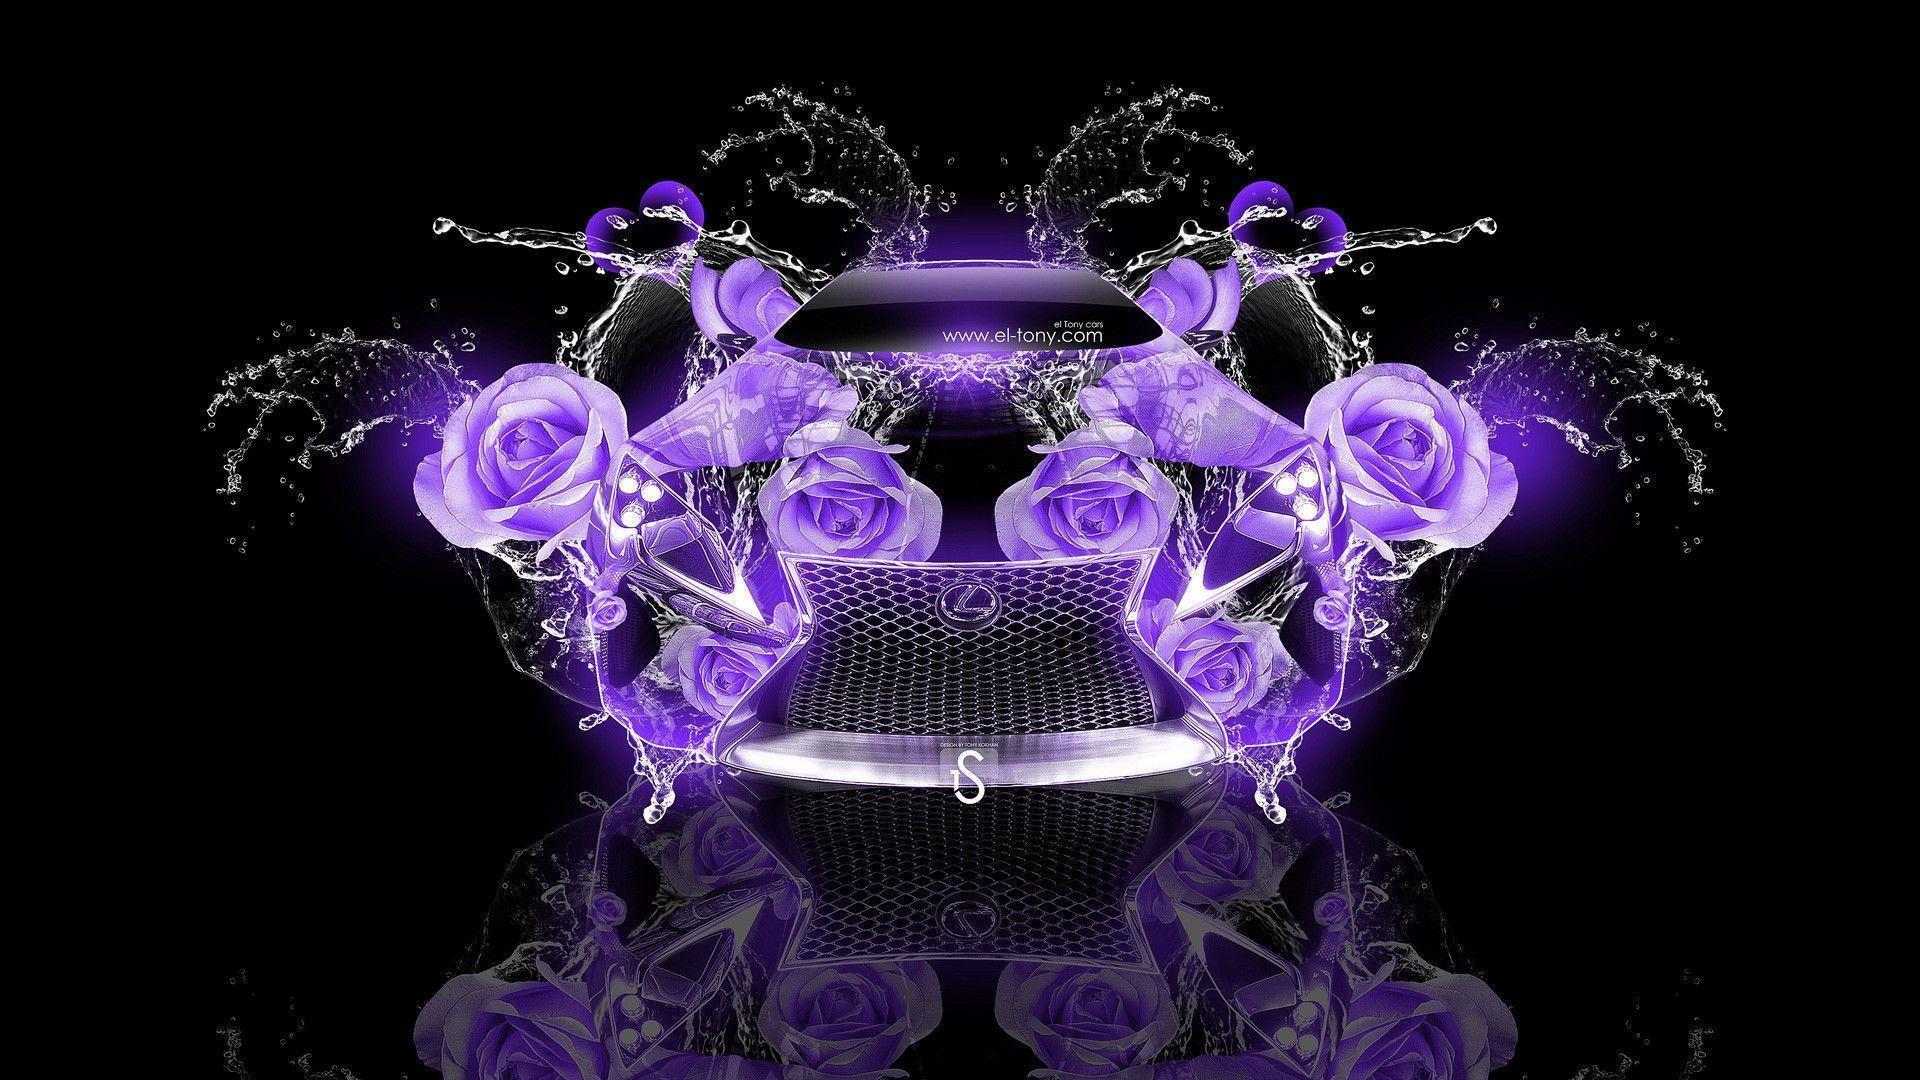 Violet Rose Wallpapers Wallpaper Cave